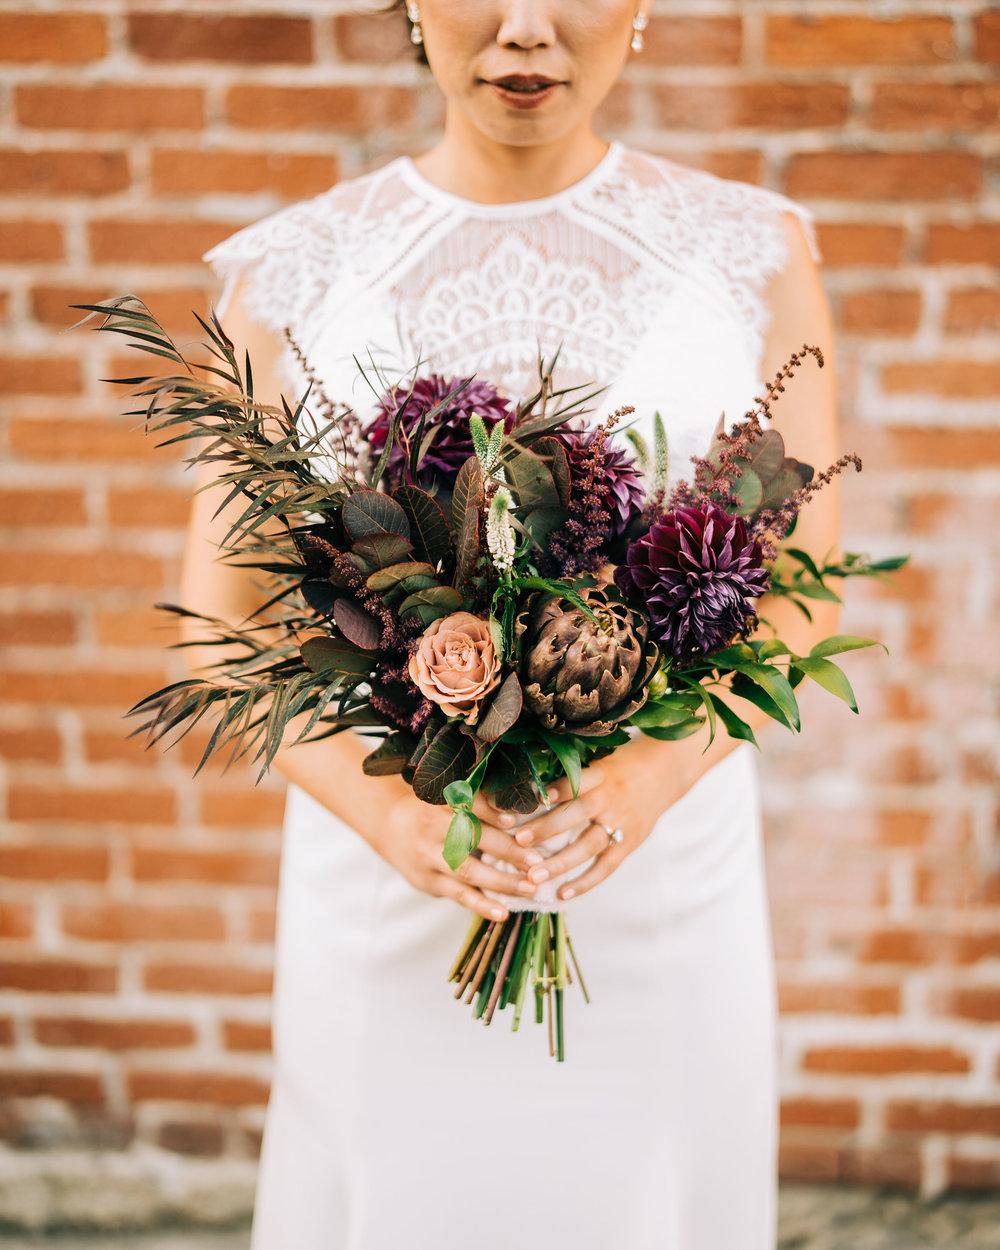 the-alley-at-daily-dose-wedding-brandon-bibbins-photography-8 (2).jpg